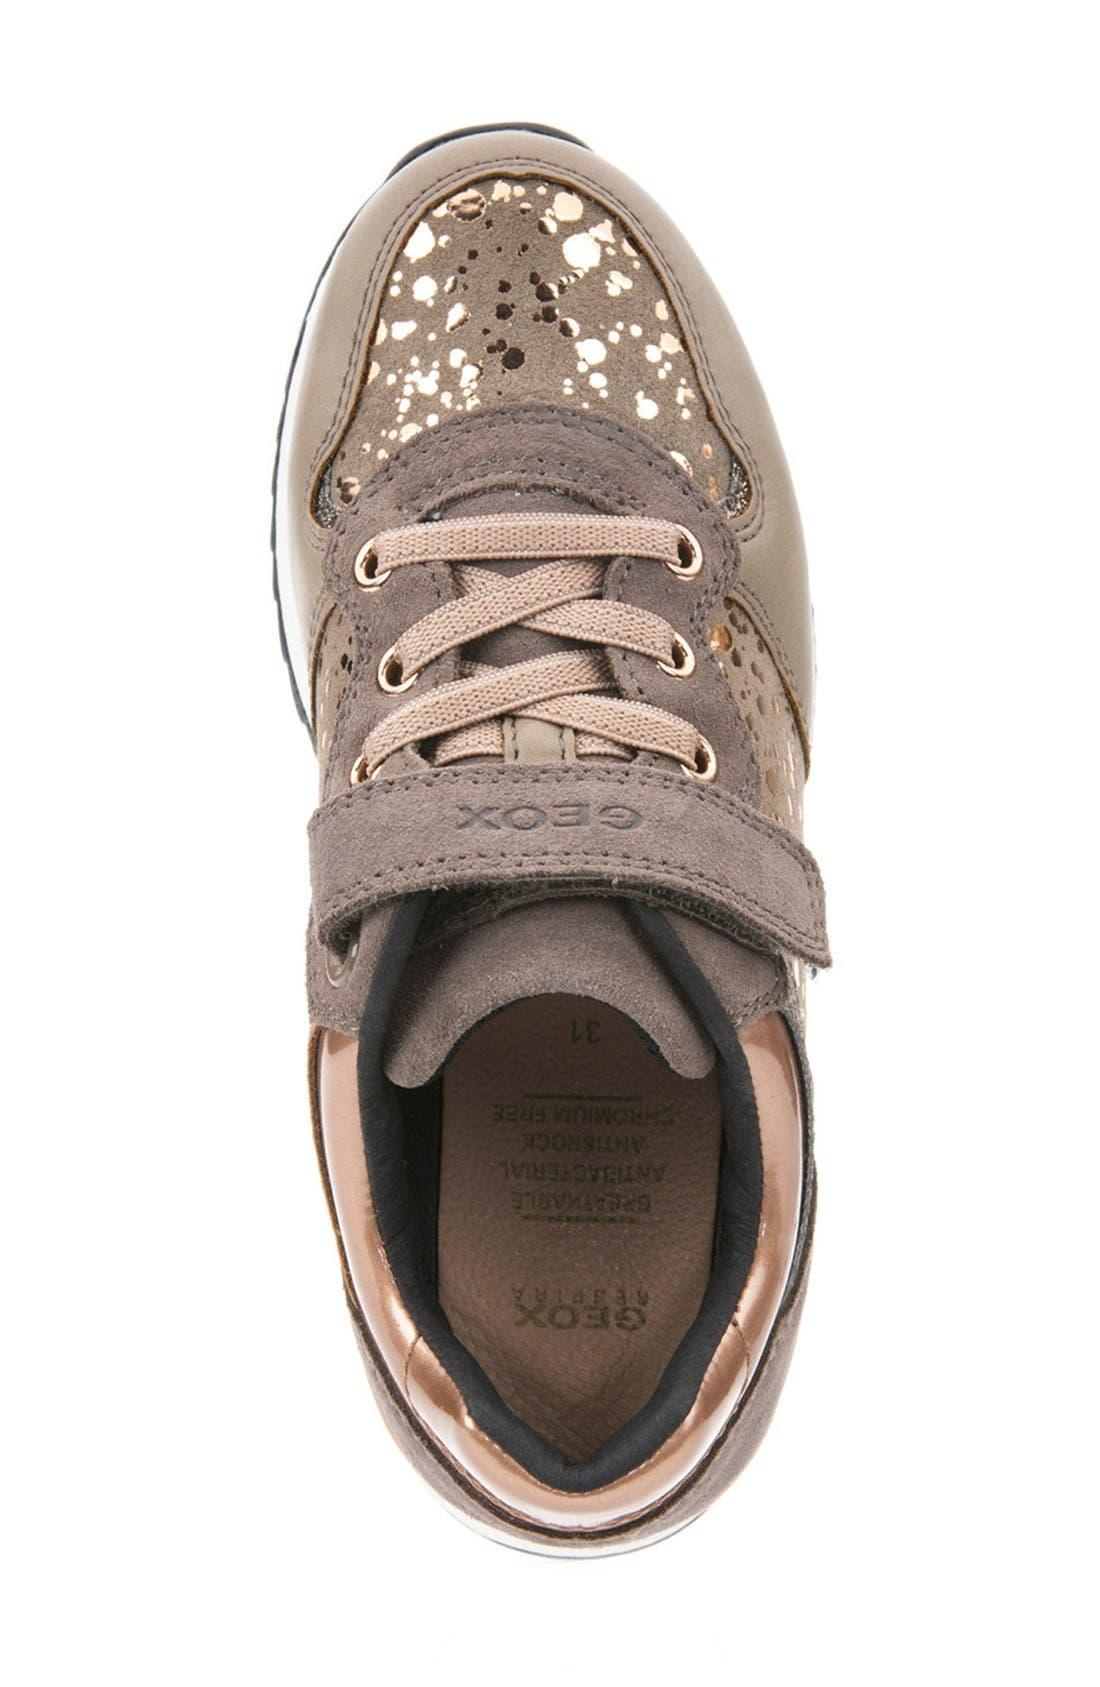 Maisie Sneaker,                             Alternate thumbnail 3, color,                             Dark Beige